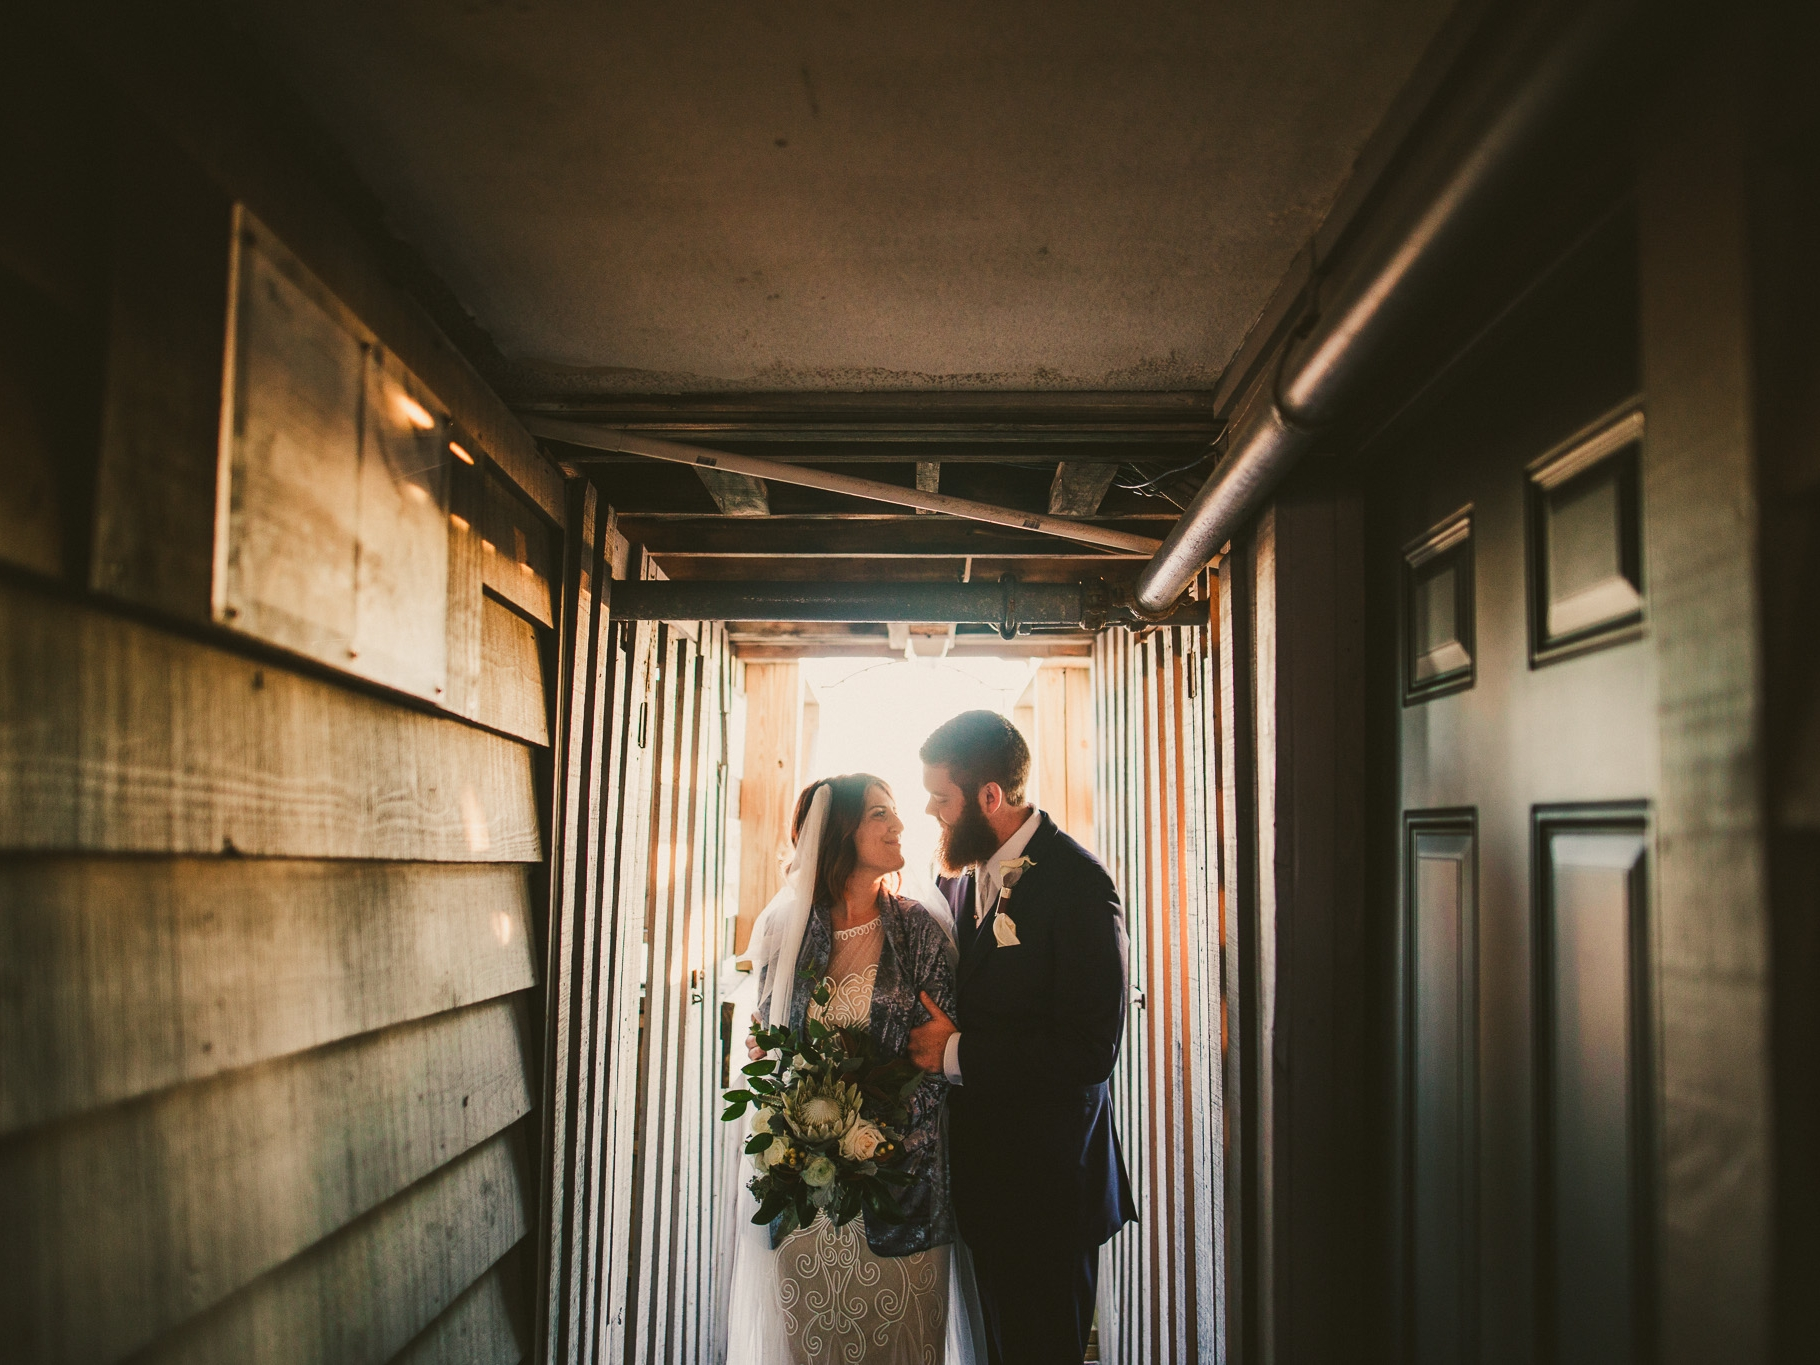 Alyssa & Robbie // Wedding - Garden City Chapel, Garden City, SC 01.14.2018